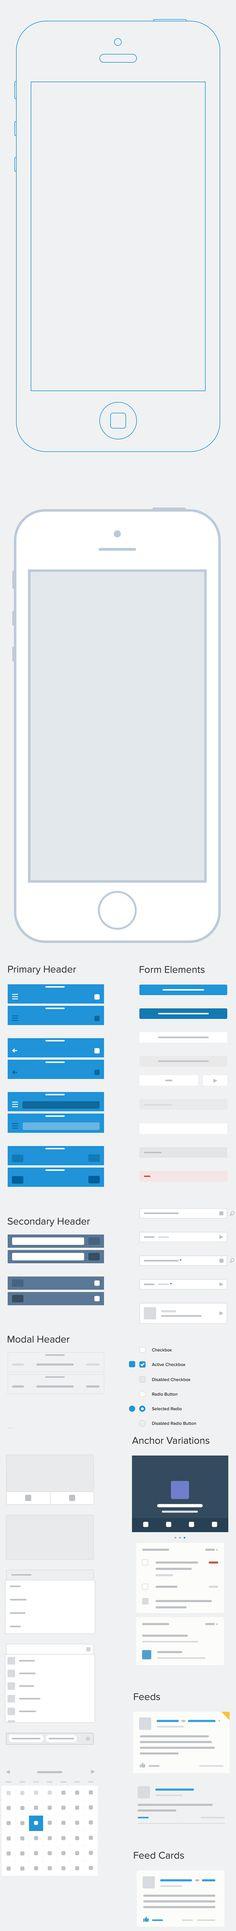 LOVES DATA LOVES ||  Mobile Sketch Wireframe Kit for Prototyping